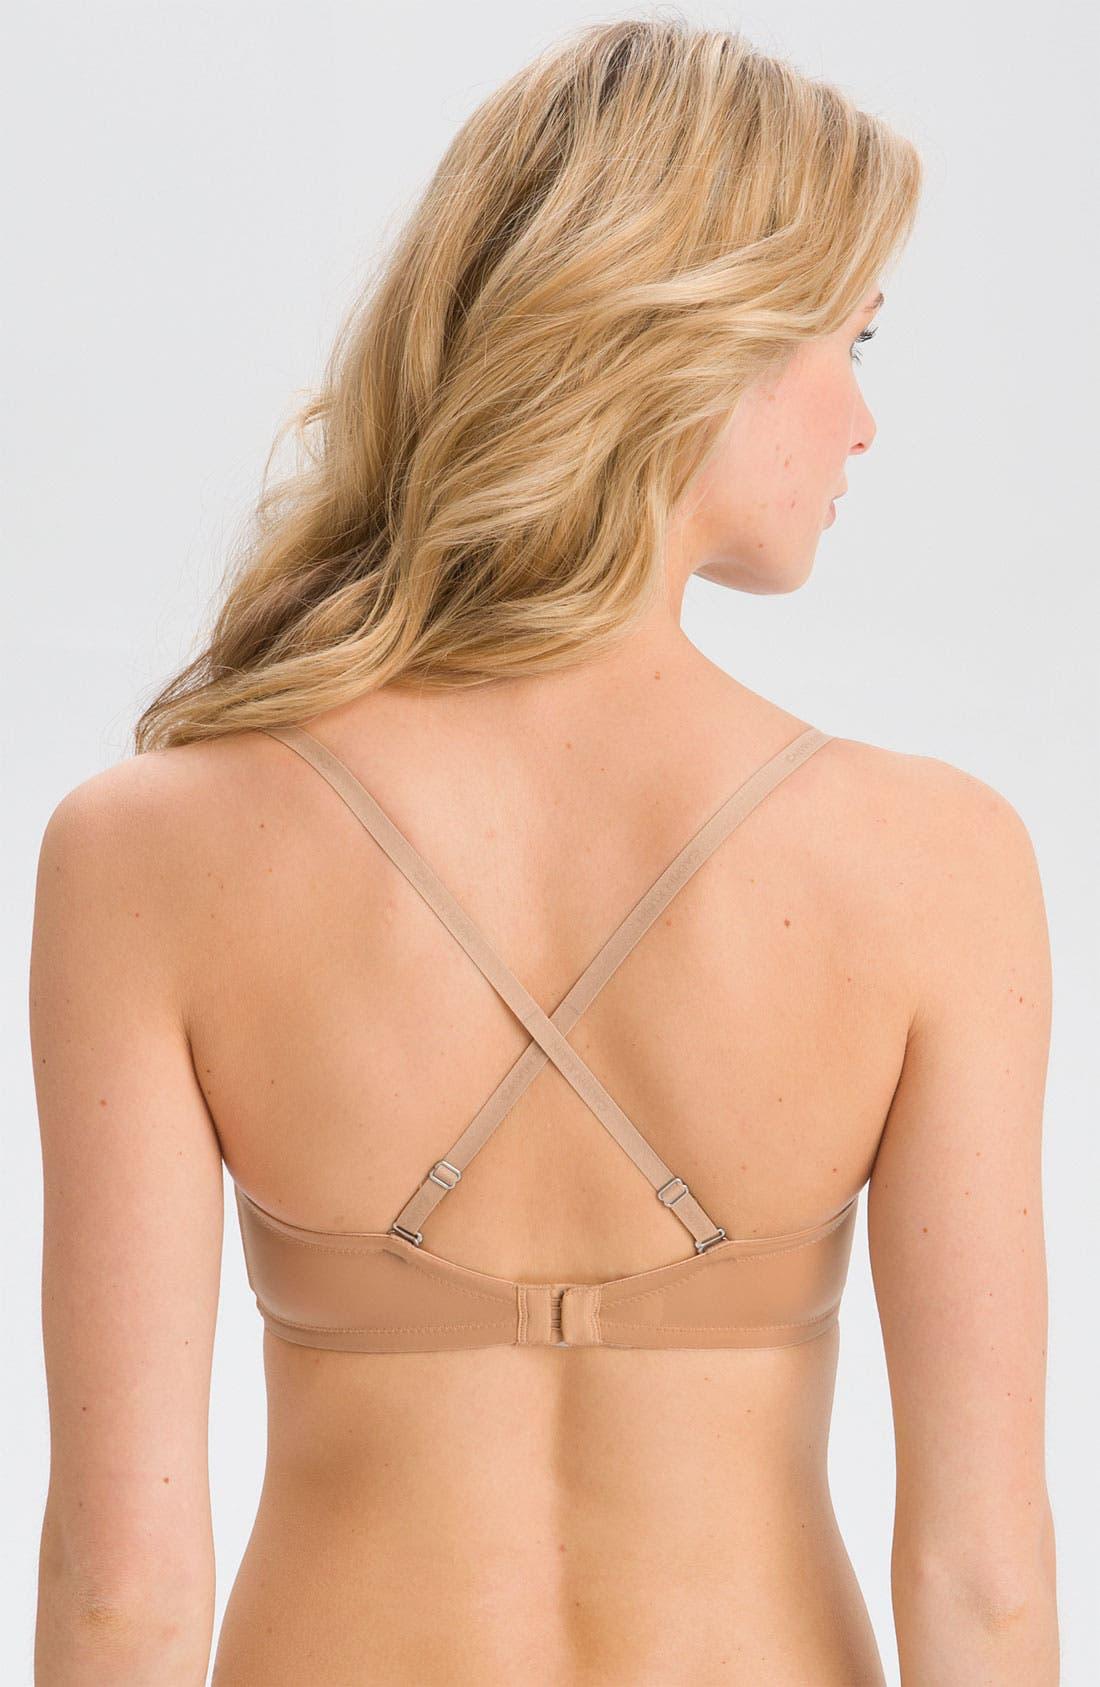 Alternate Image 2  - Calvin Klein 'Naked Glamour' Convertible Strapless Push-Up Bra